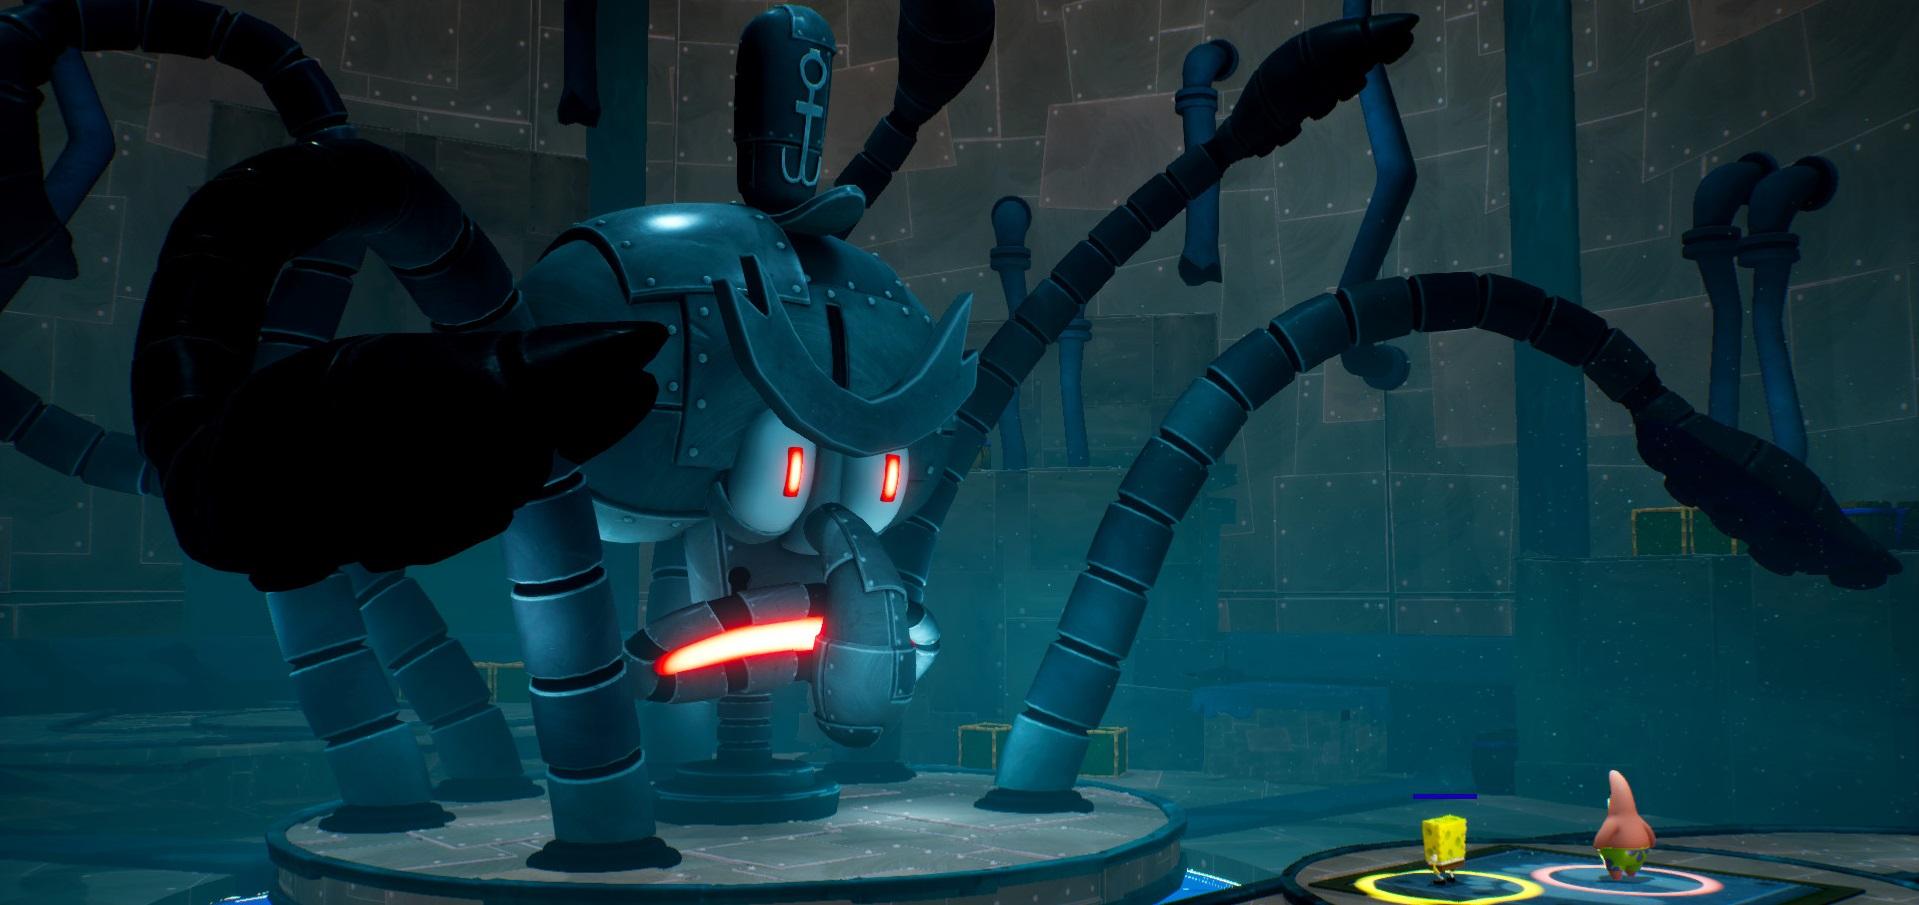 Who has a multiplayer horde mode under the sea? SpongeBob SquarePants! screenshot